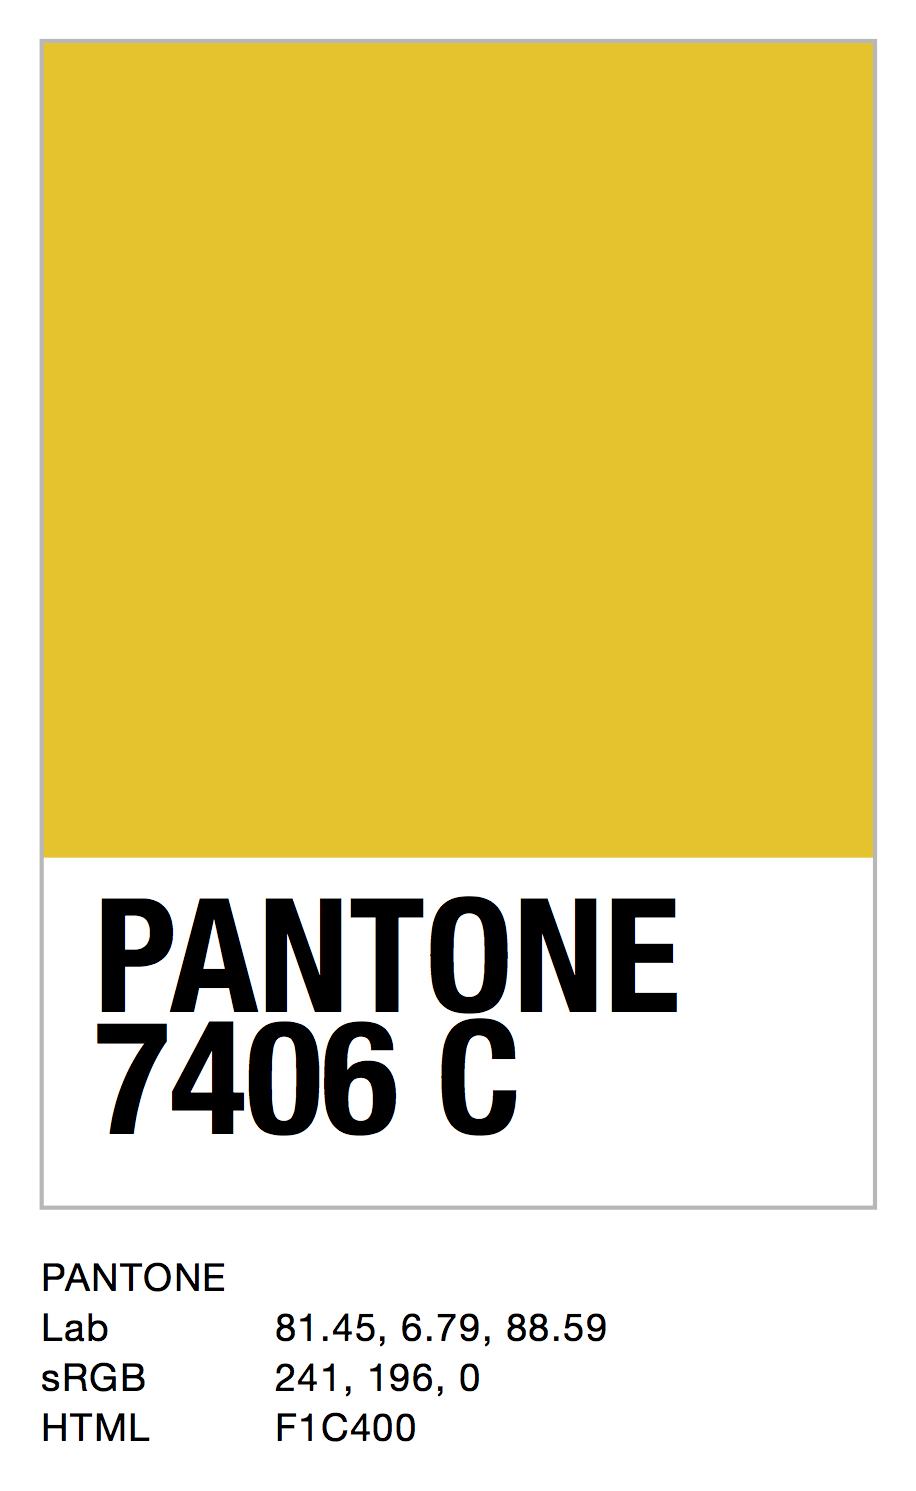 PANTONE 7406 C.jpg